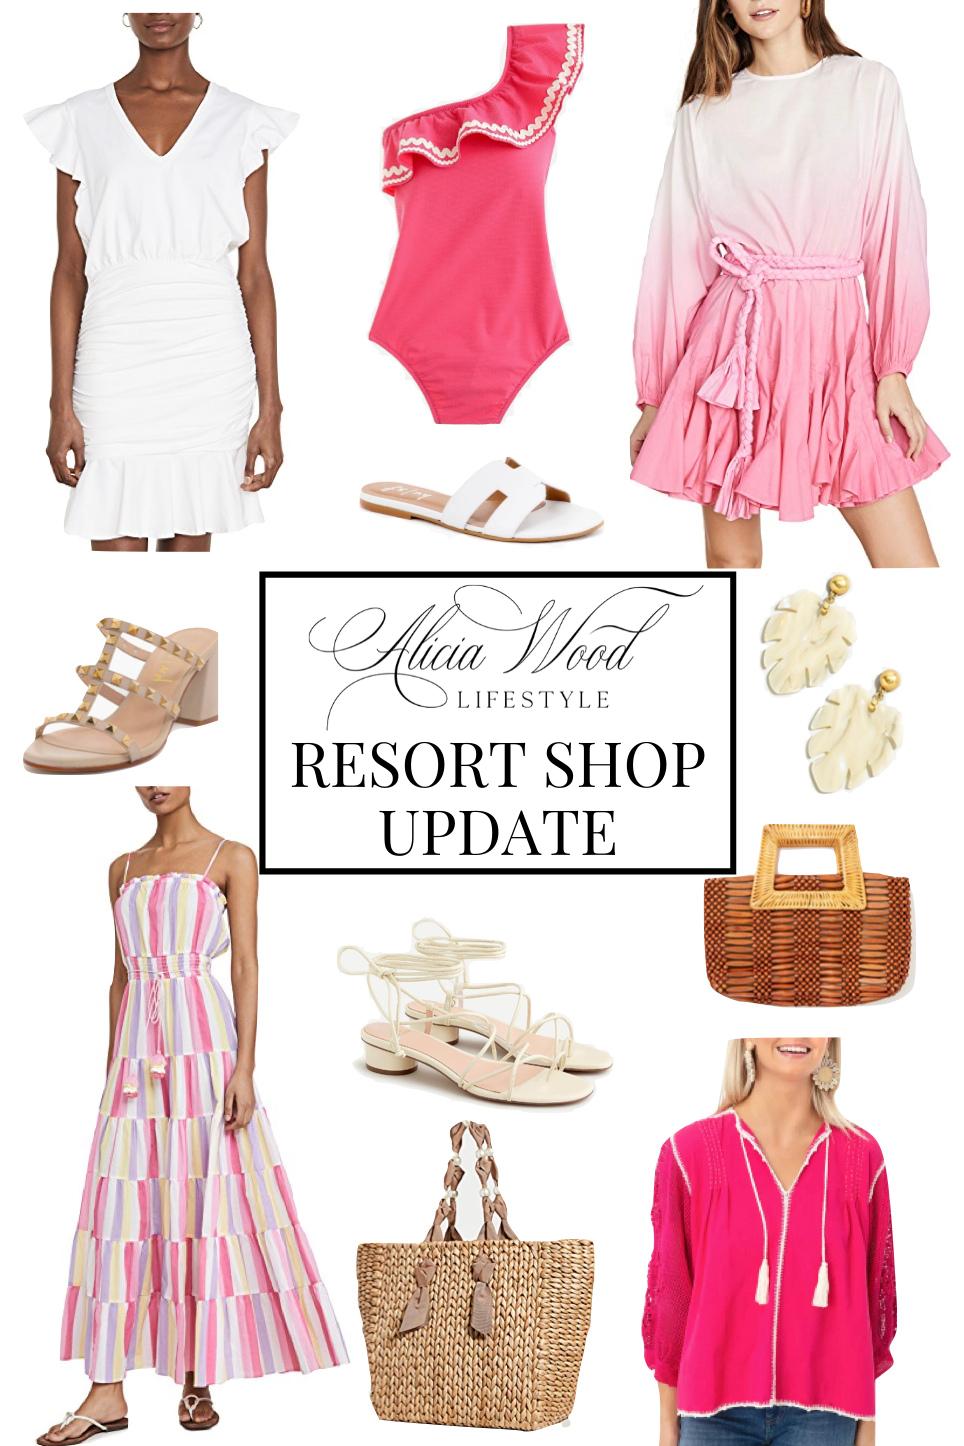 Resort Shop Update: Spring Break Edition